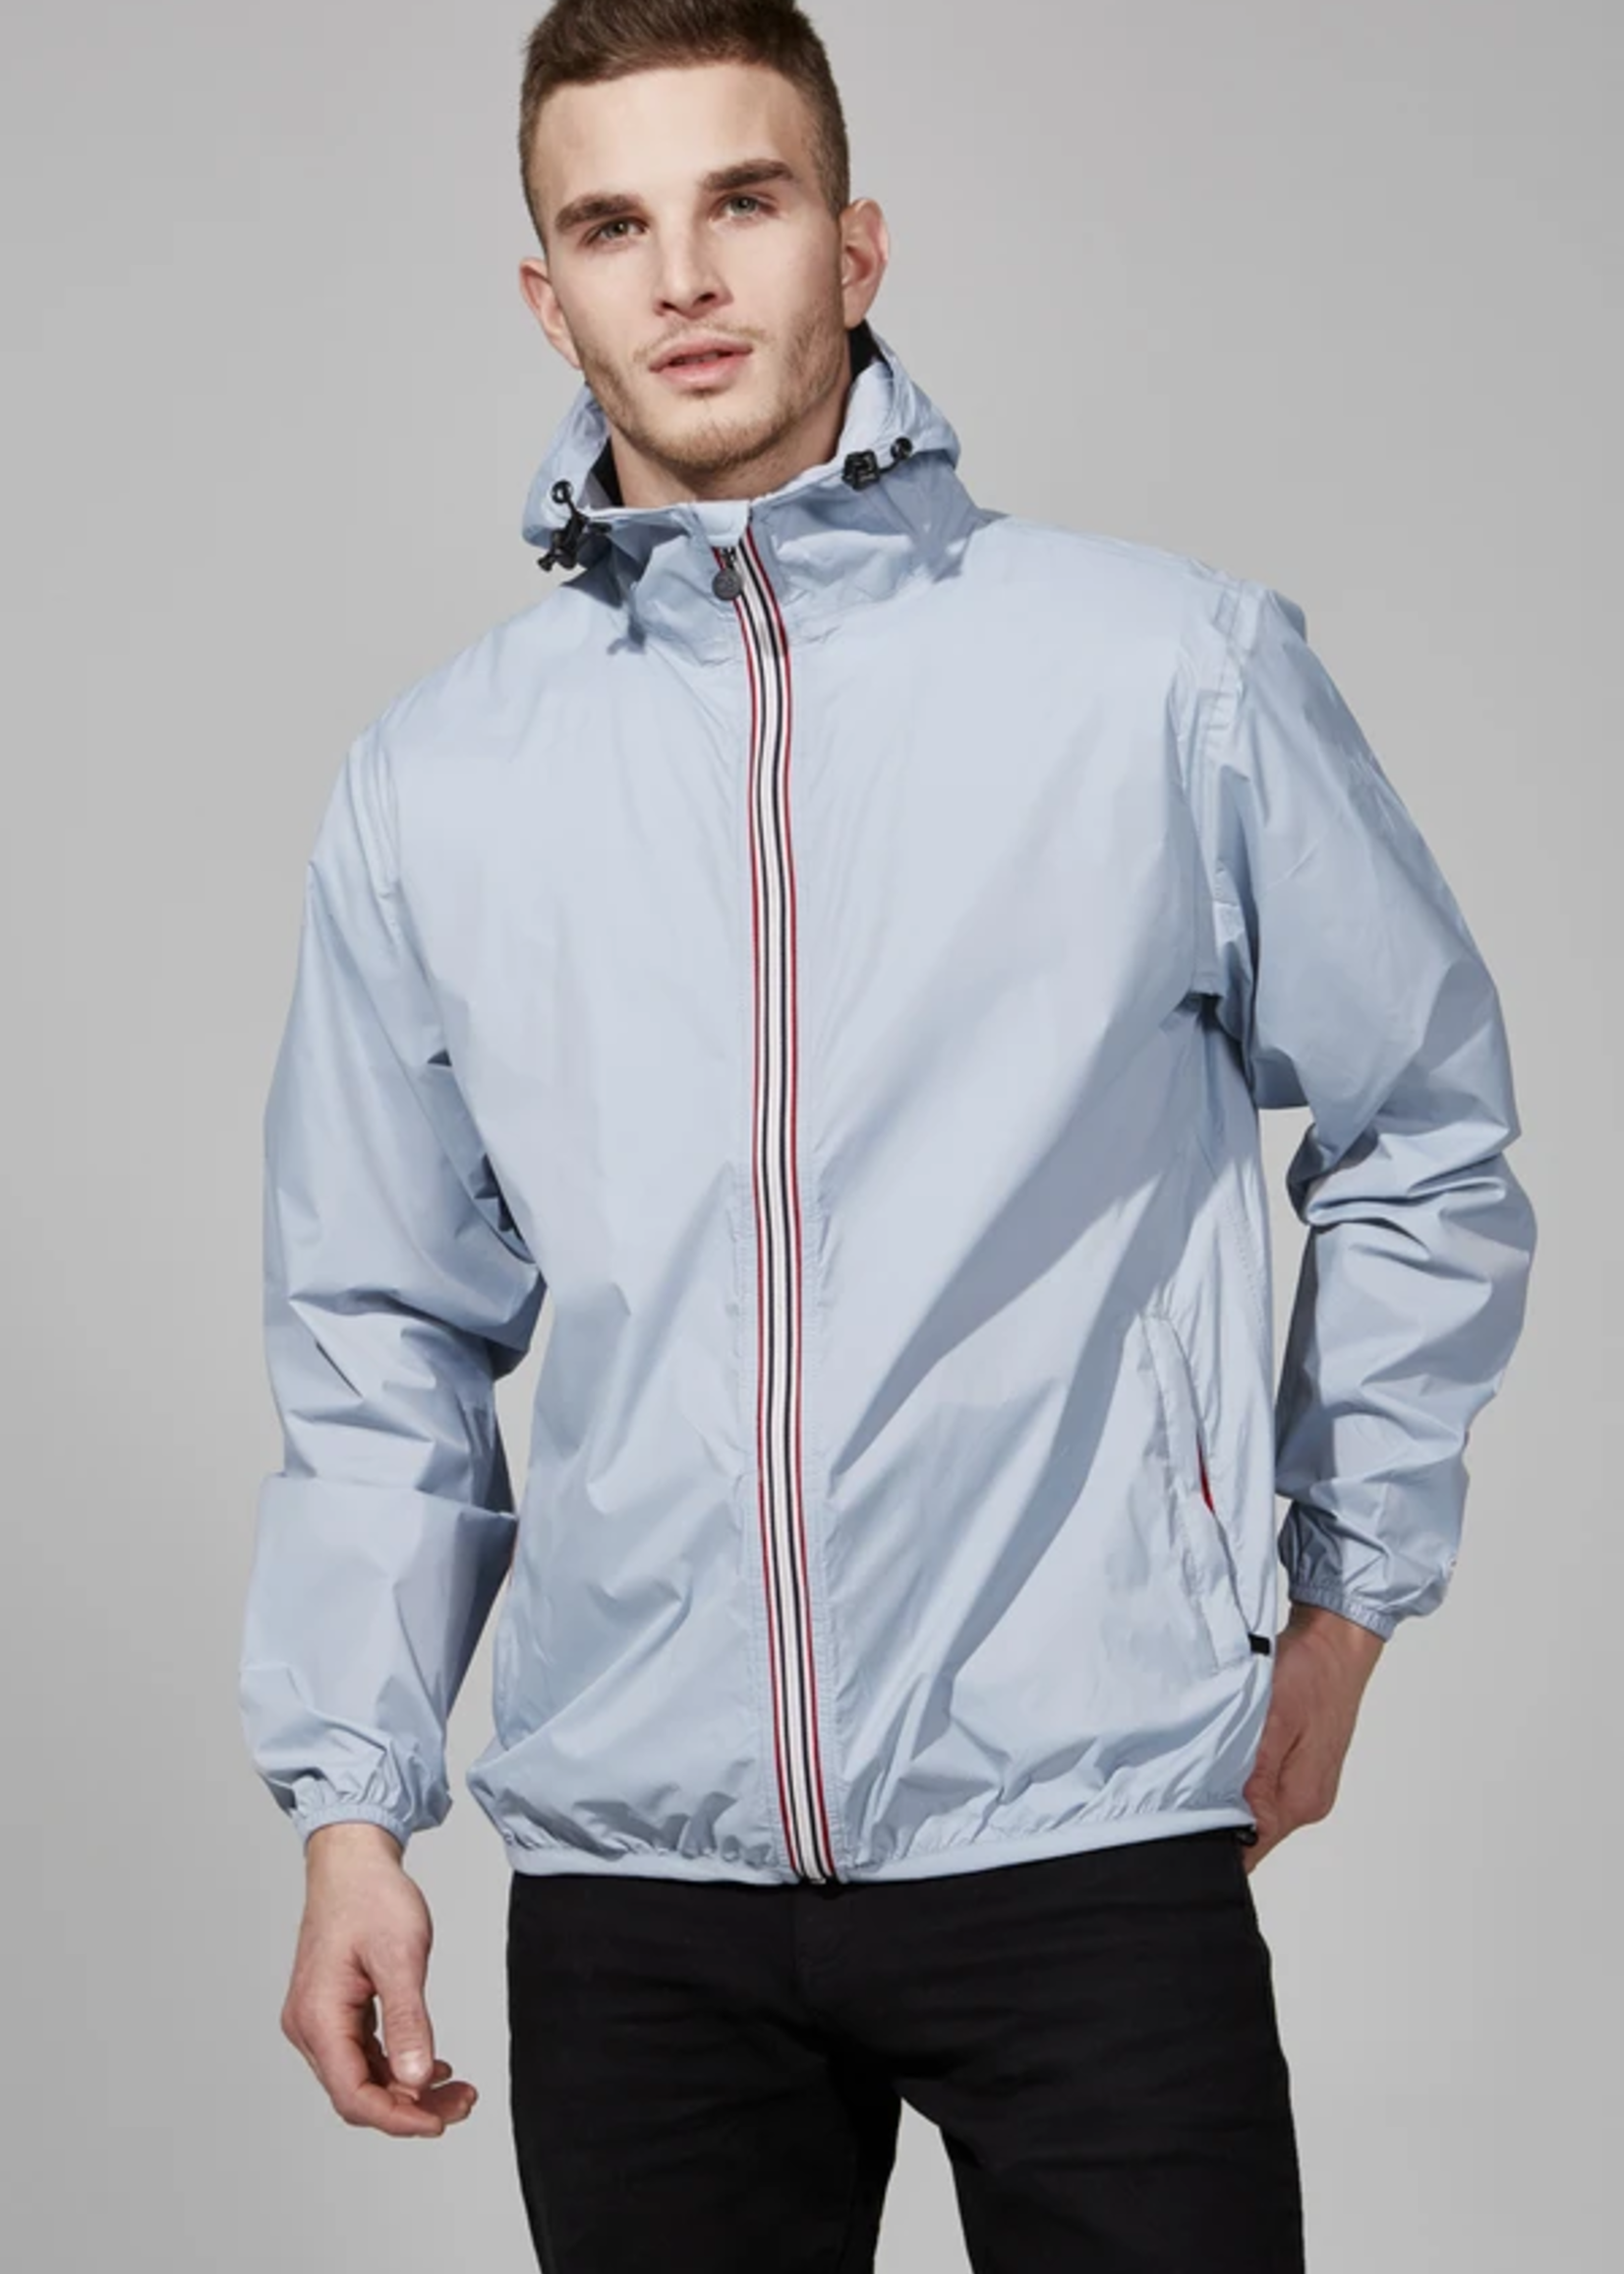 O8 O8 Men's Zip Jacket (Celestial Blue)